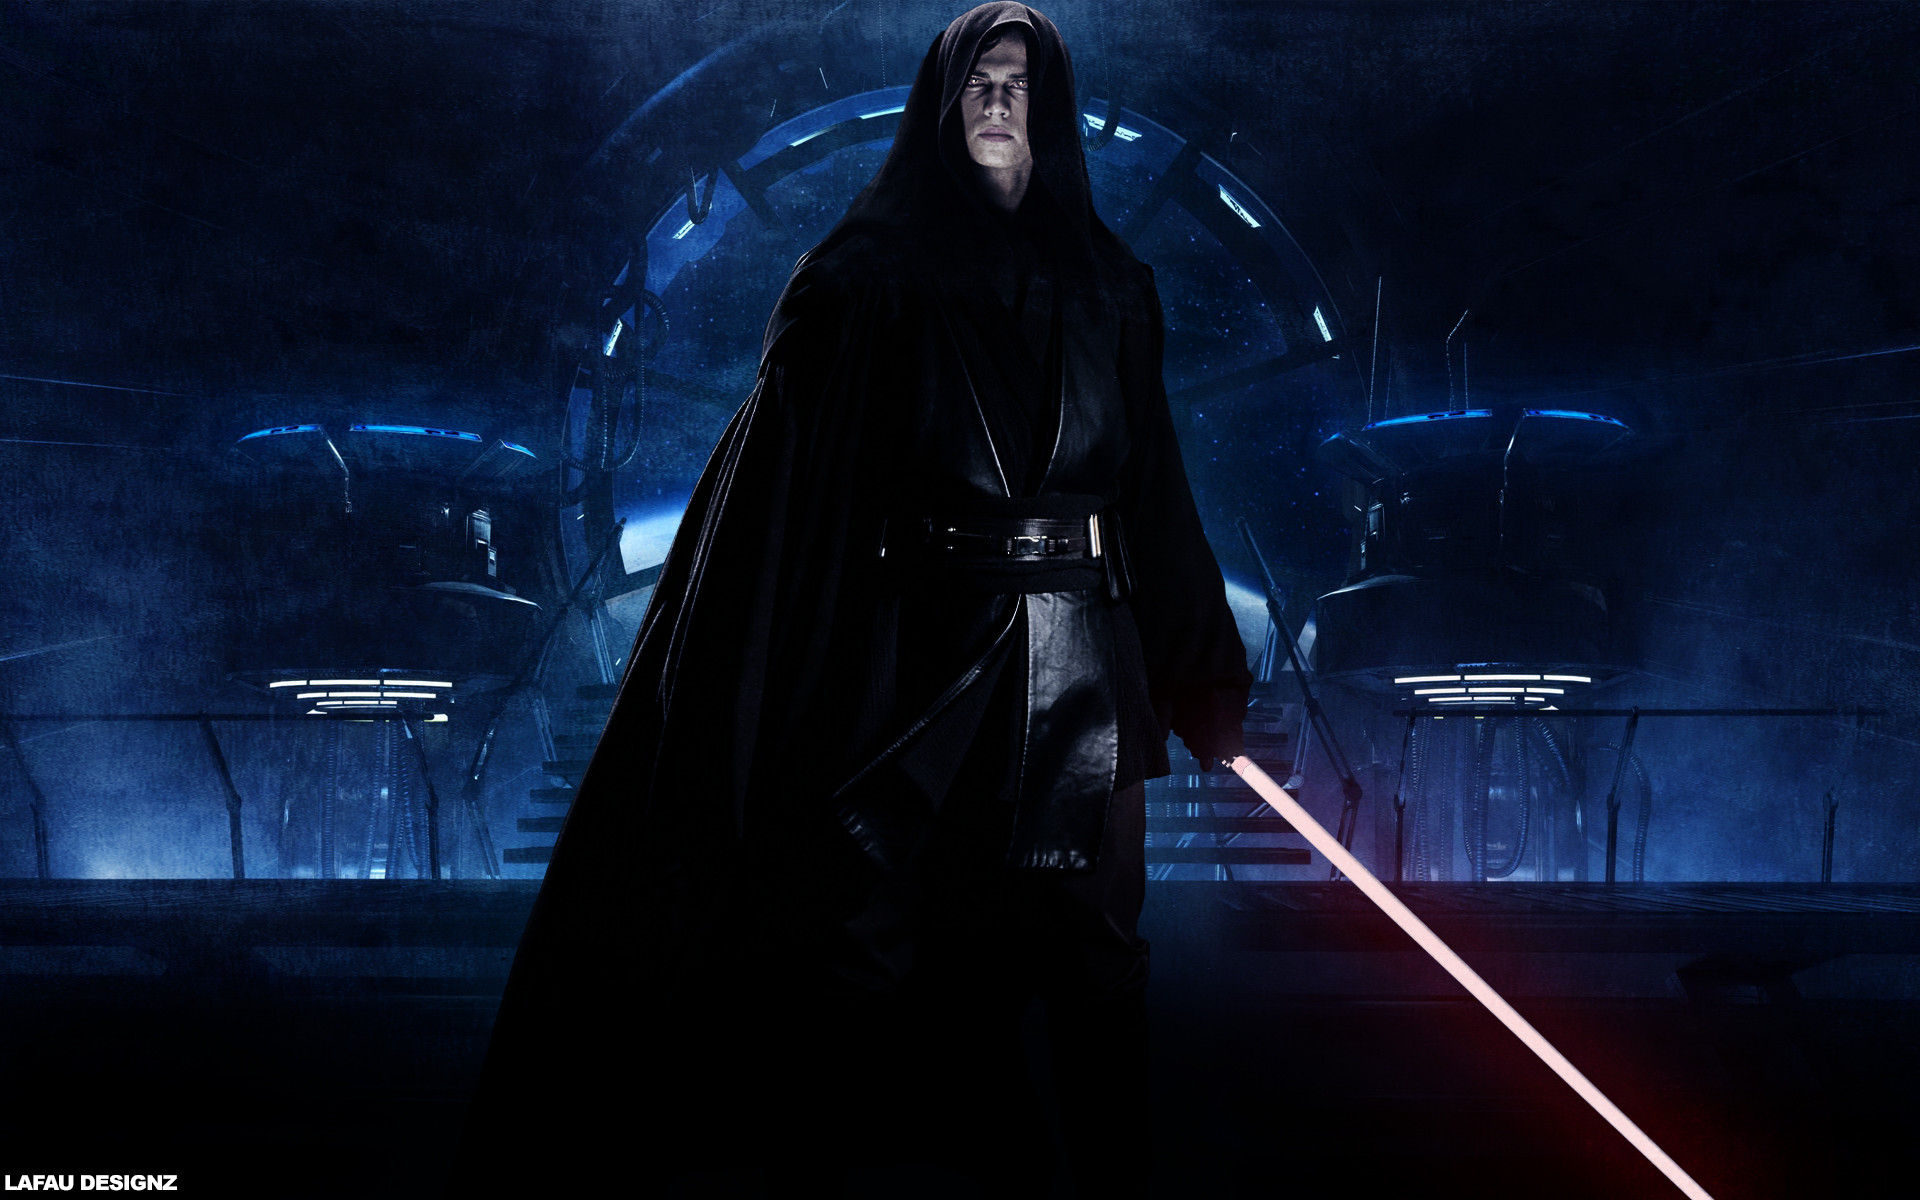 Star Wars Anakin Skywalker Wallpaper 75 Images